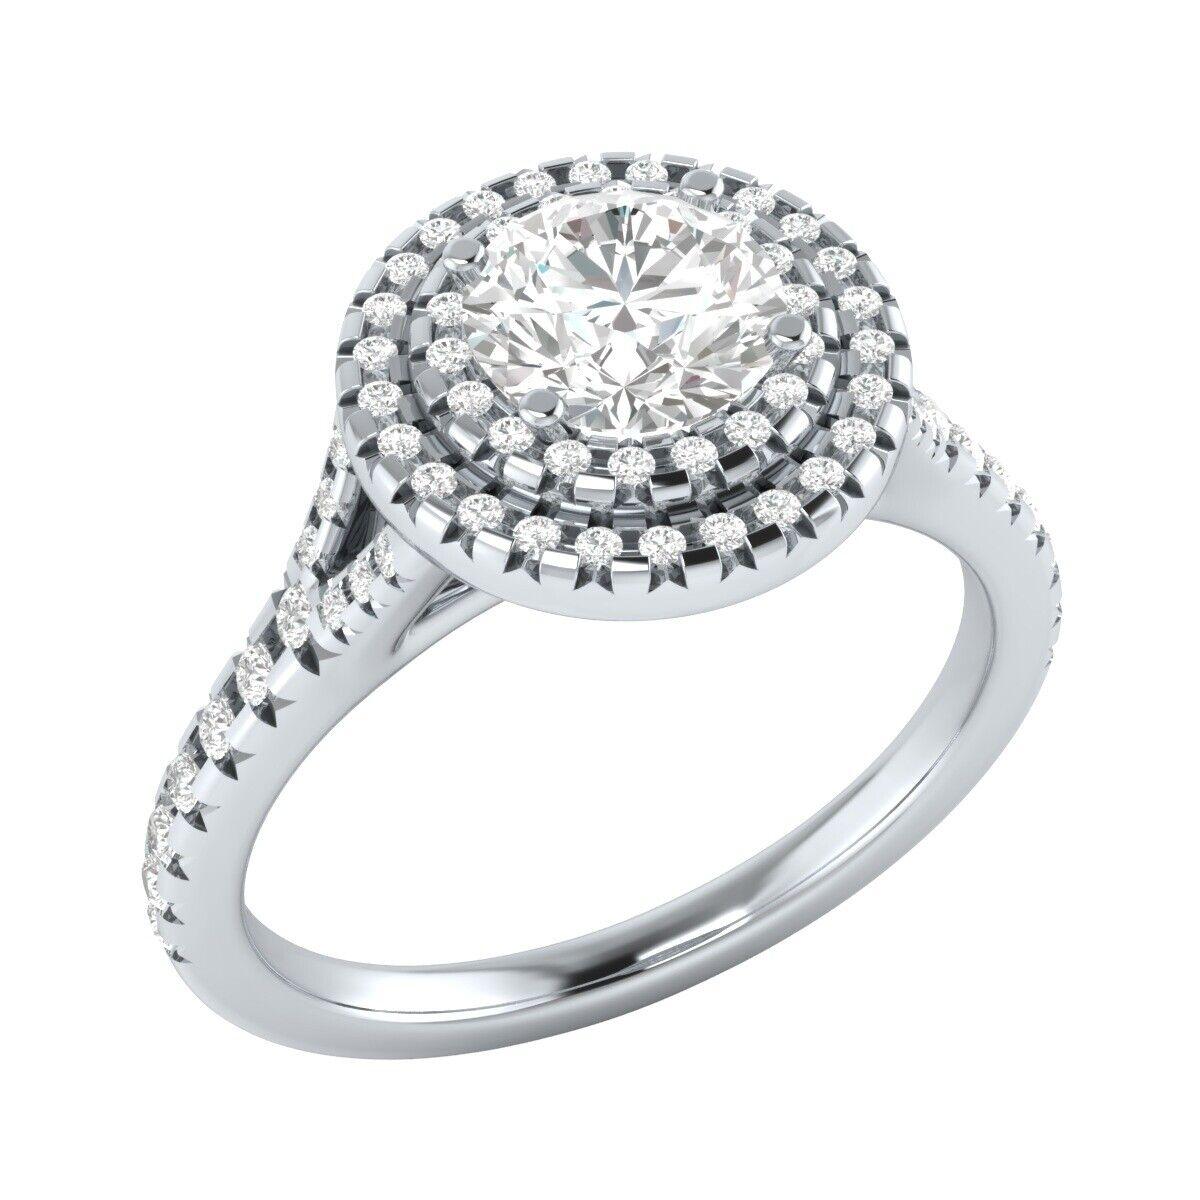 0.95 Ct Double Halo Round Diamond Engagement Wedding Ring 14k White gold Over